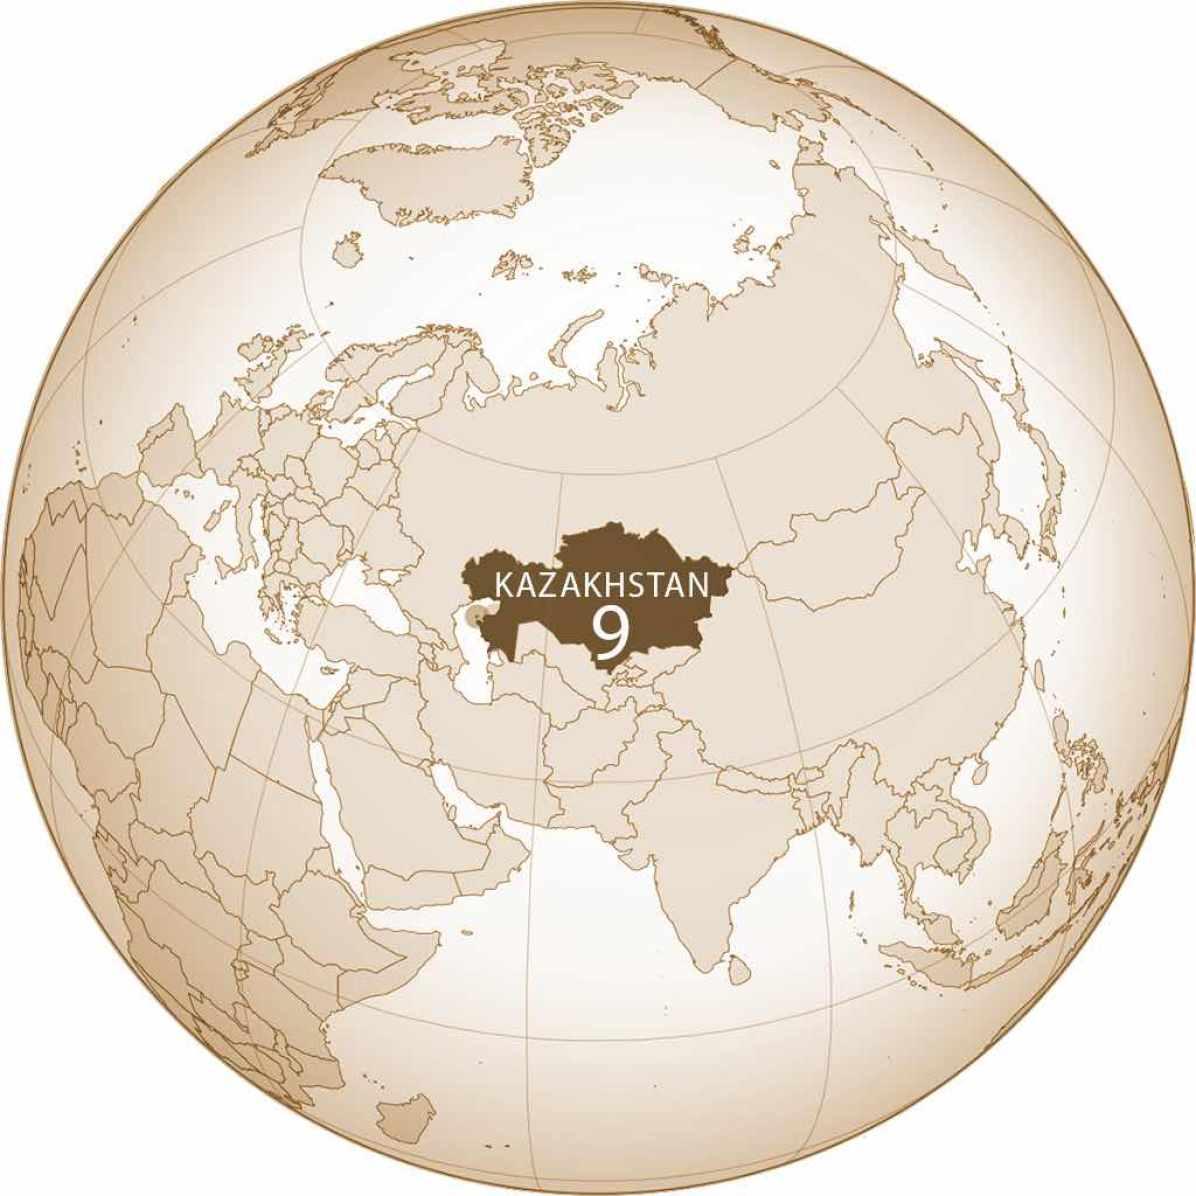 Kazakhstan World Map - by Turkish Flame/Wikimedia + S Solberg J